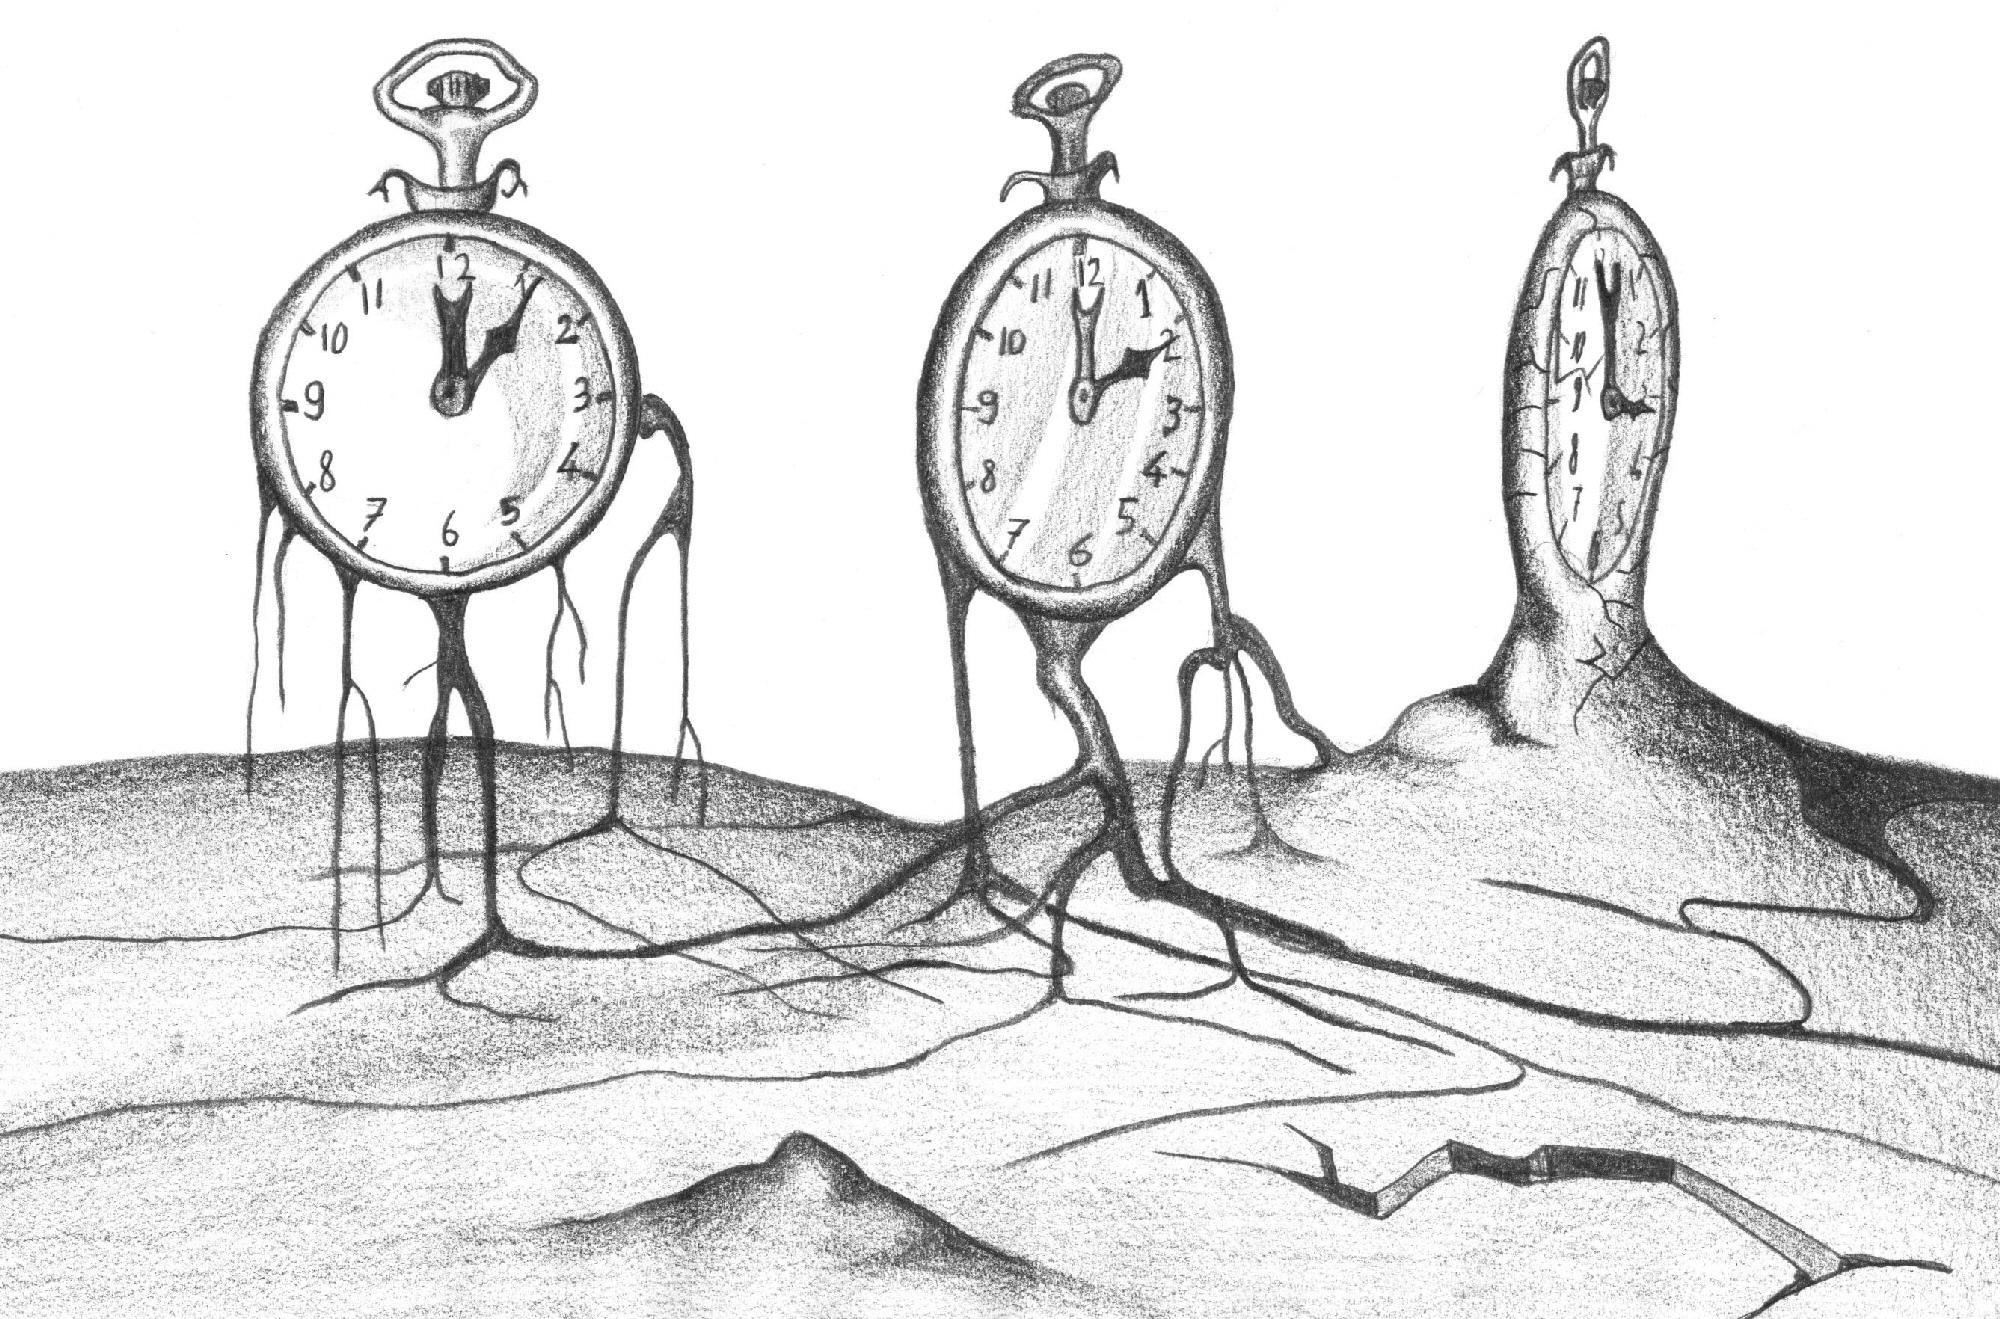 .xino.ch » Dessins Pour Divers Projets concernant Dessin D Horloge